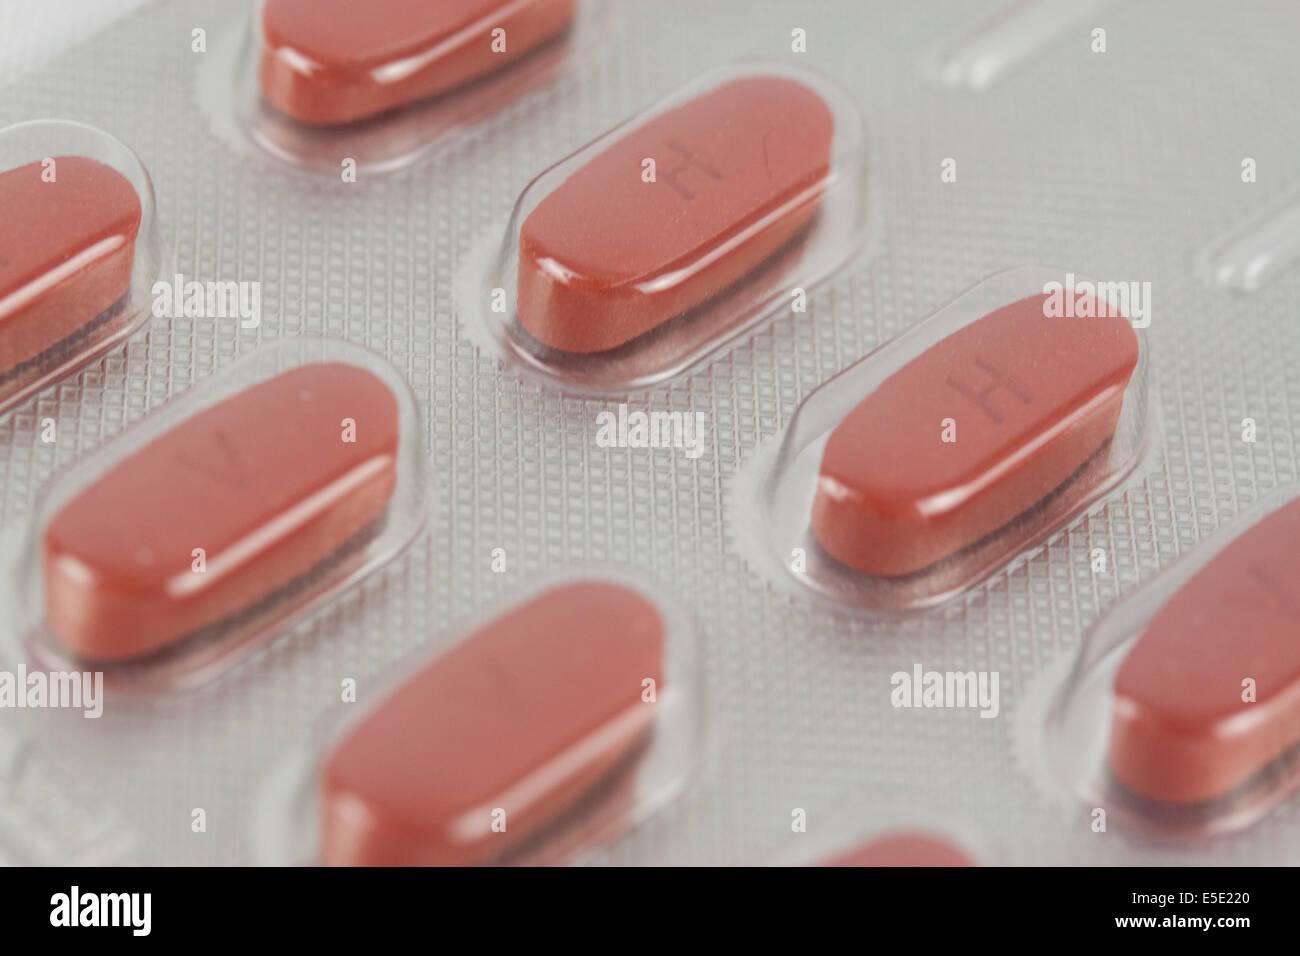 tabletten medikamente rot pillen medikament pille tablette apotheke gesundheit medizin medizinisch pharma pharmazie Stock Photo